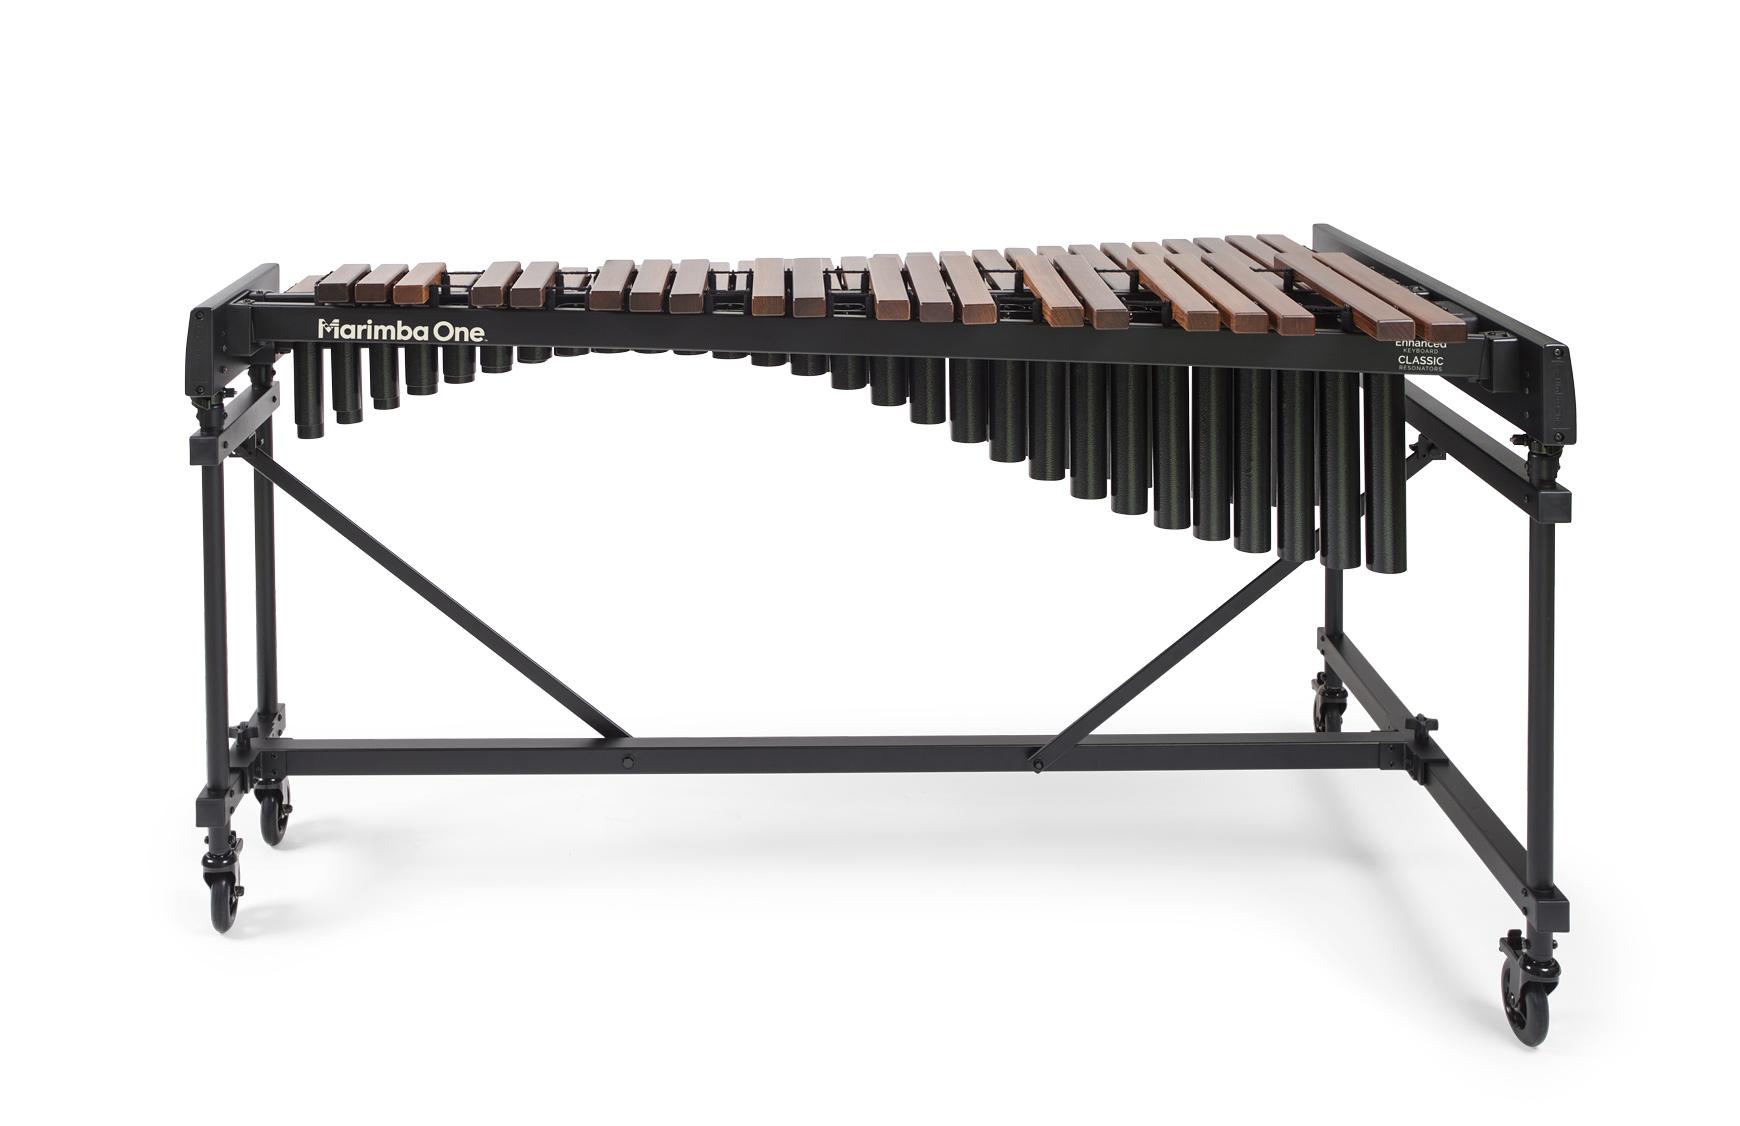 #9701 Marimba One Concert Xylophone 3.5 Octave with Traditional keyboard 3.5個八度、傳統琴鍵、玫瑰木